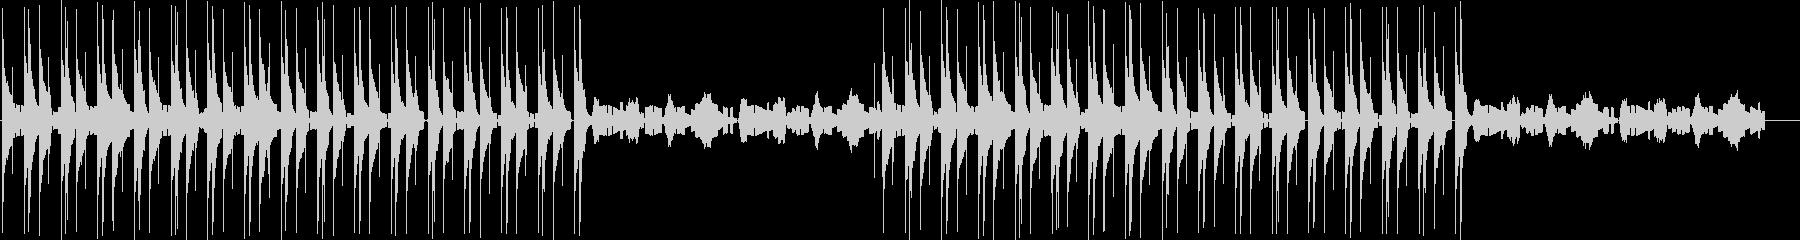 Lo-Fiな音色のエレクトロの未再生の波形